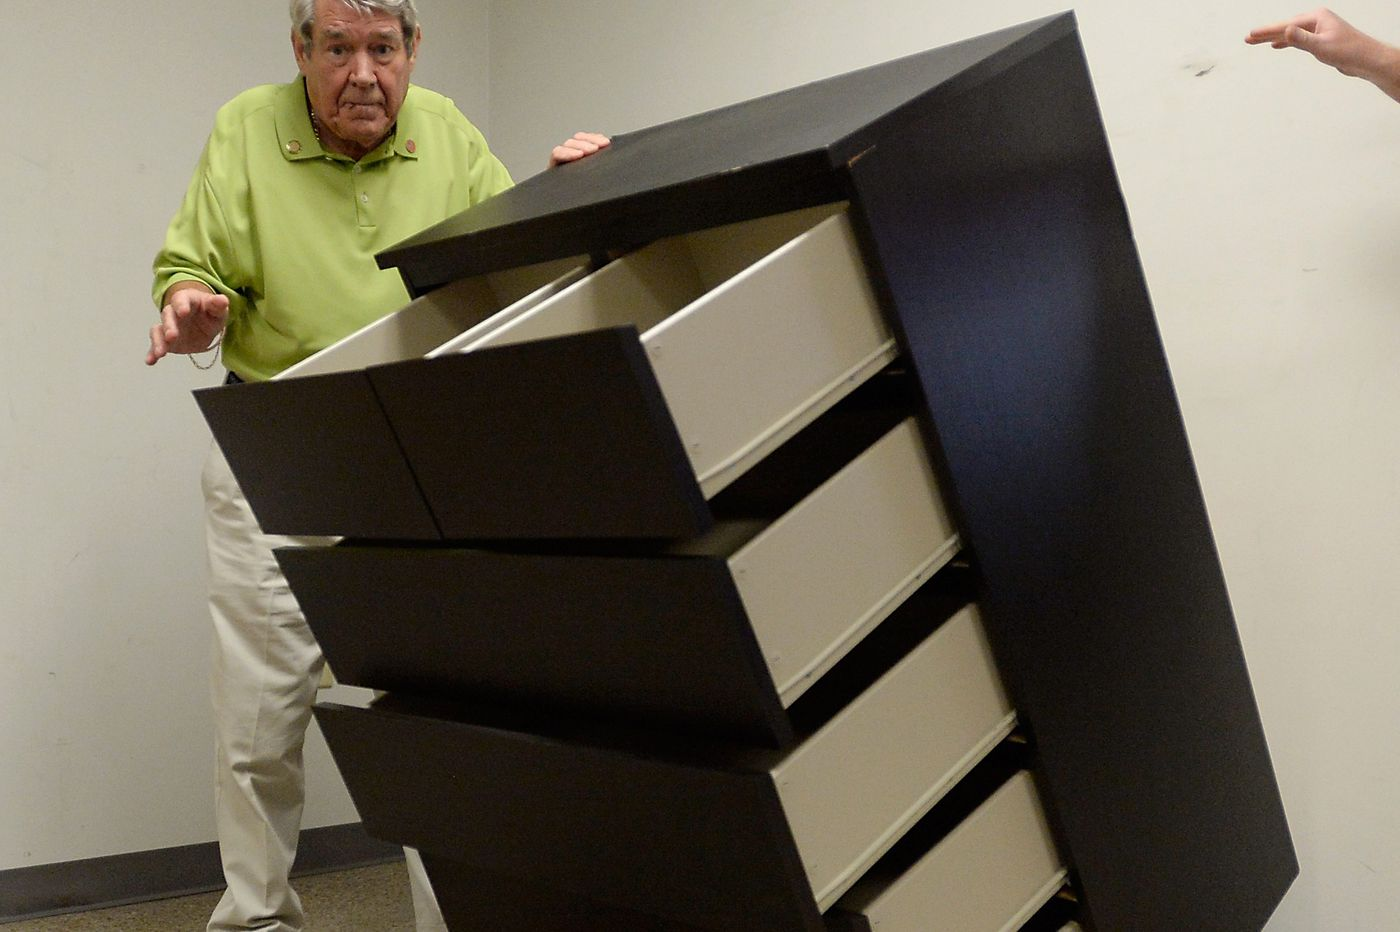 Ikea recall of tip-over dresser still active | Opinion